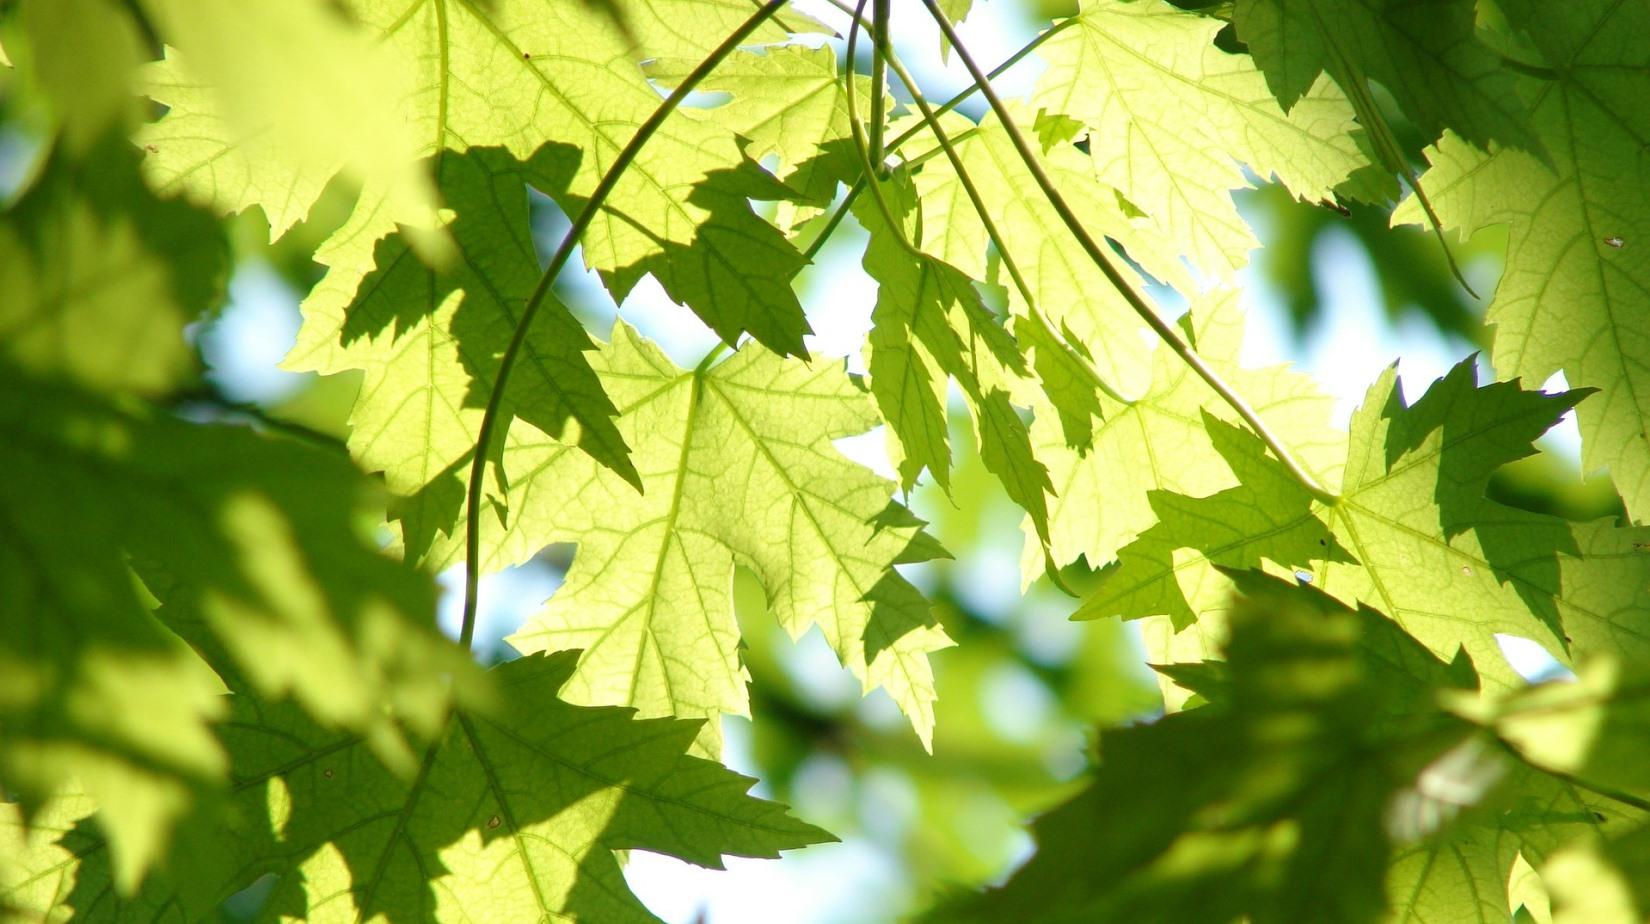 Green leaves on tree